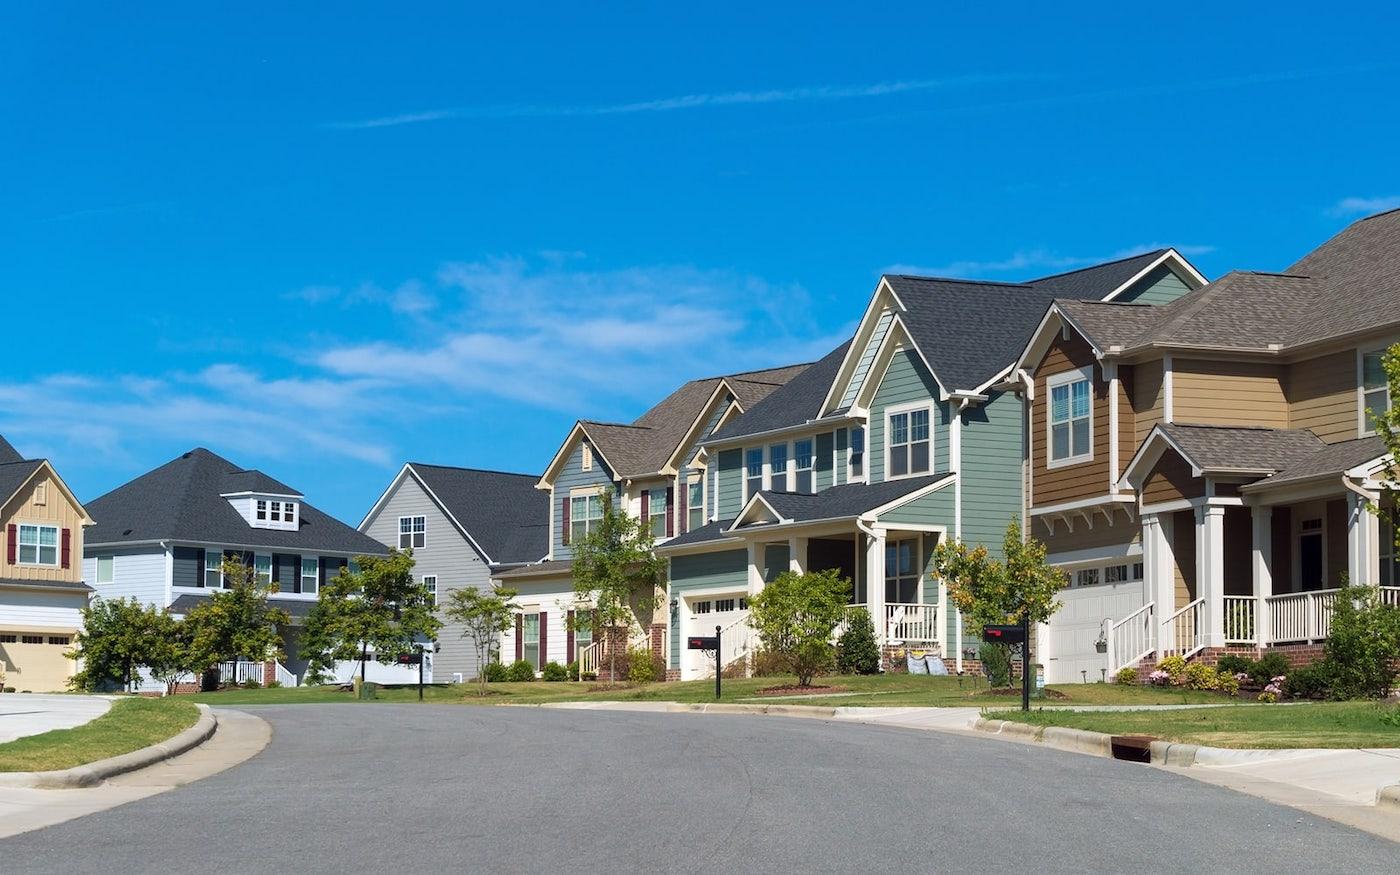 Las Vegas Real Estate: Do Open Houses Work?